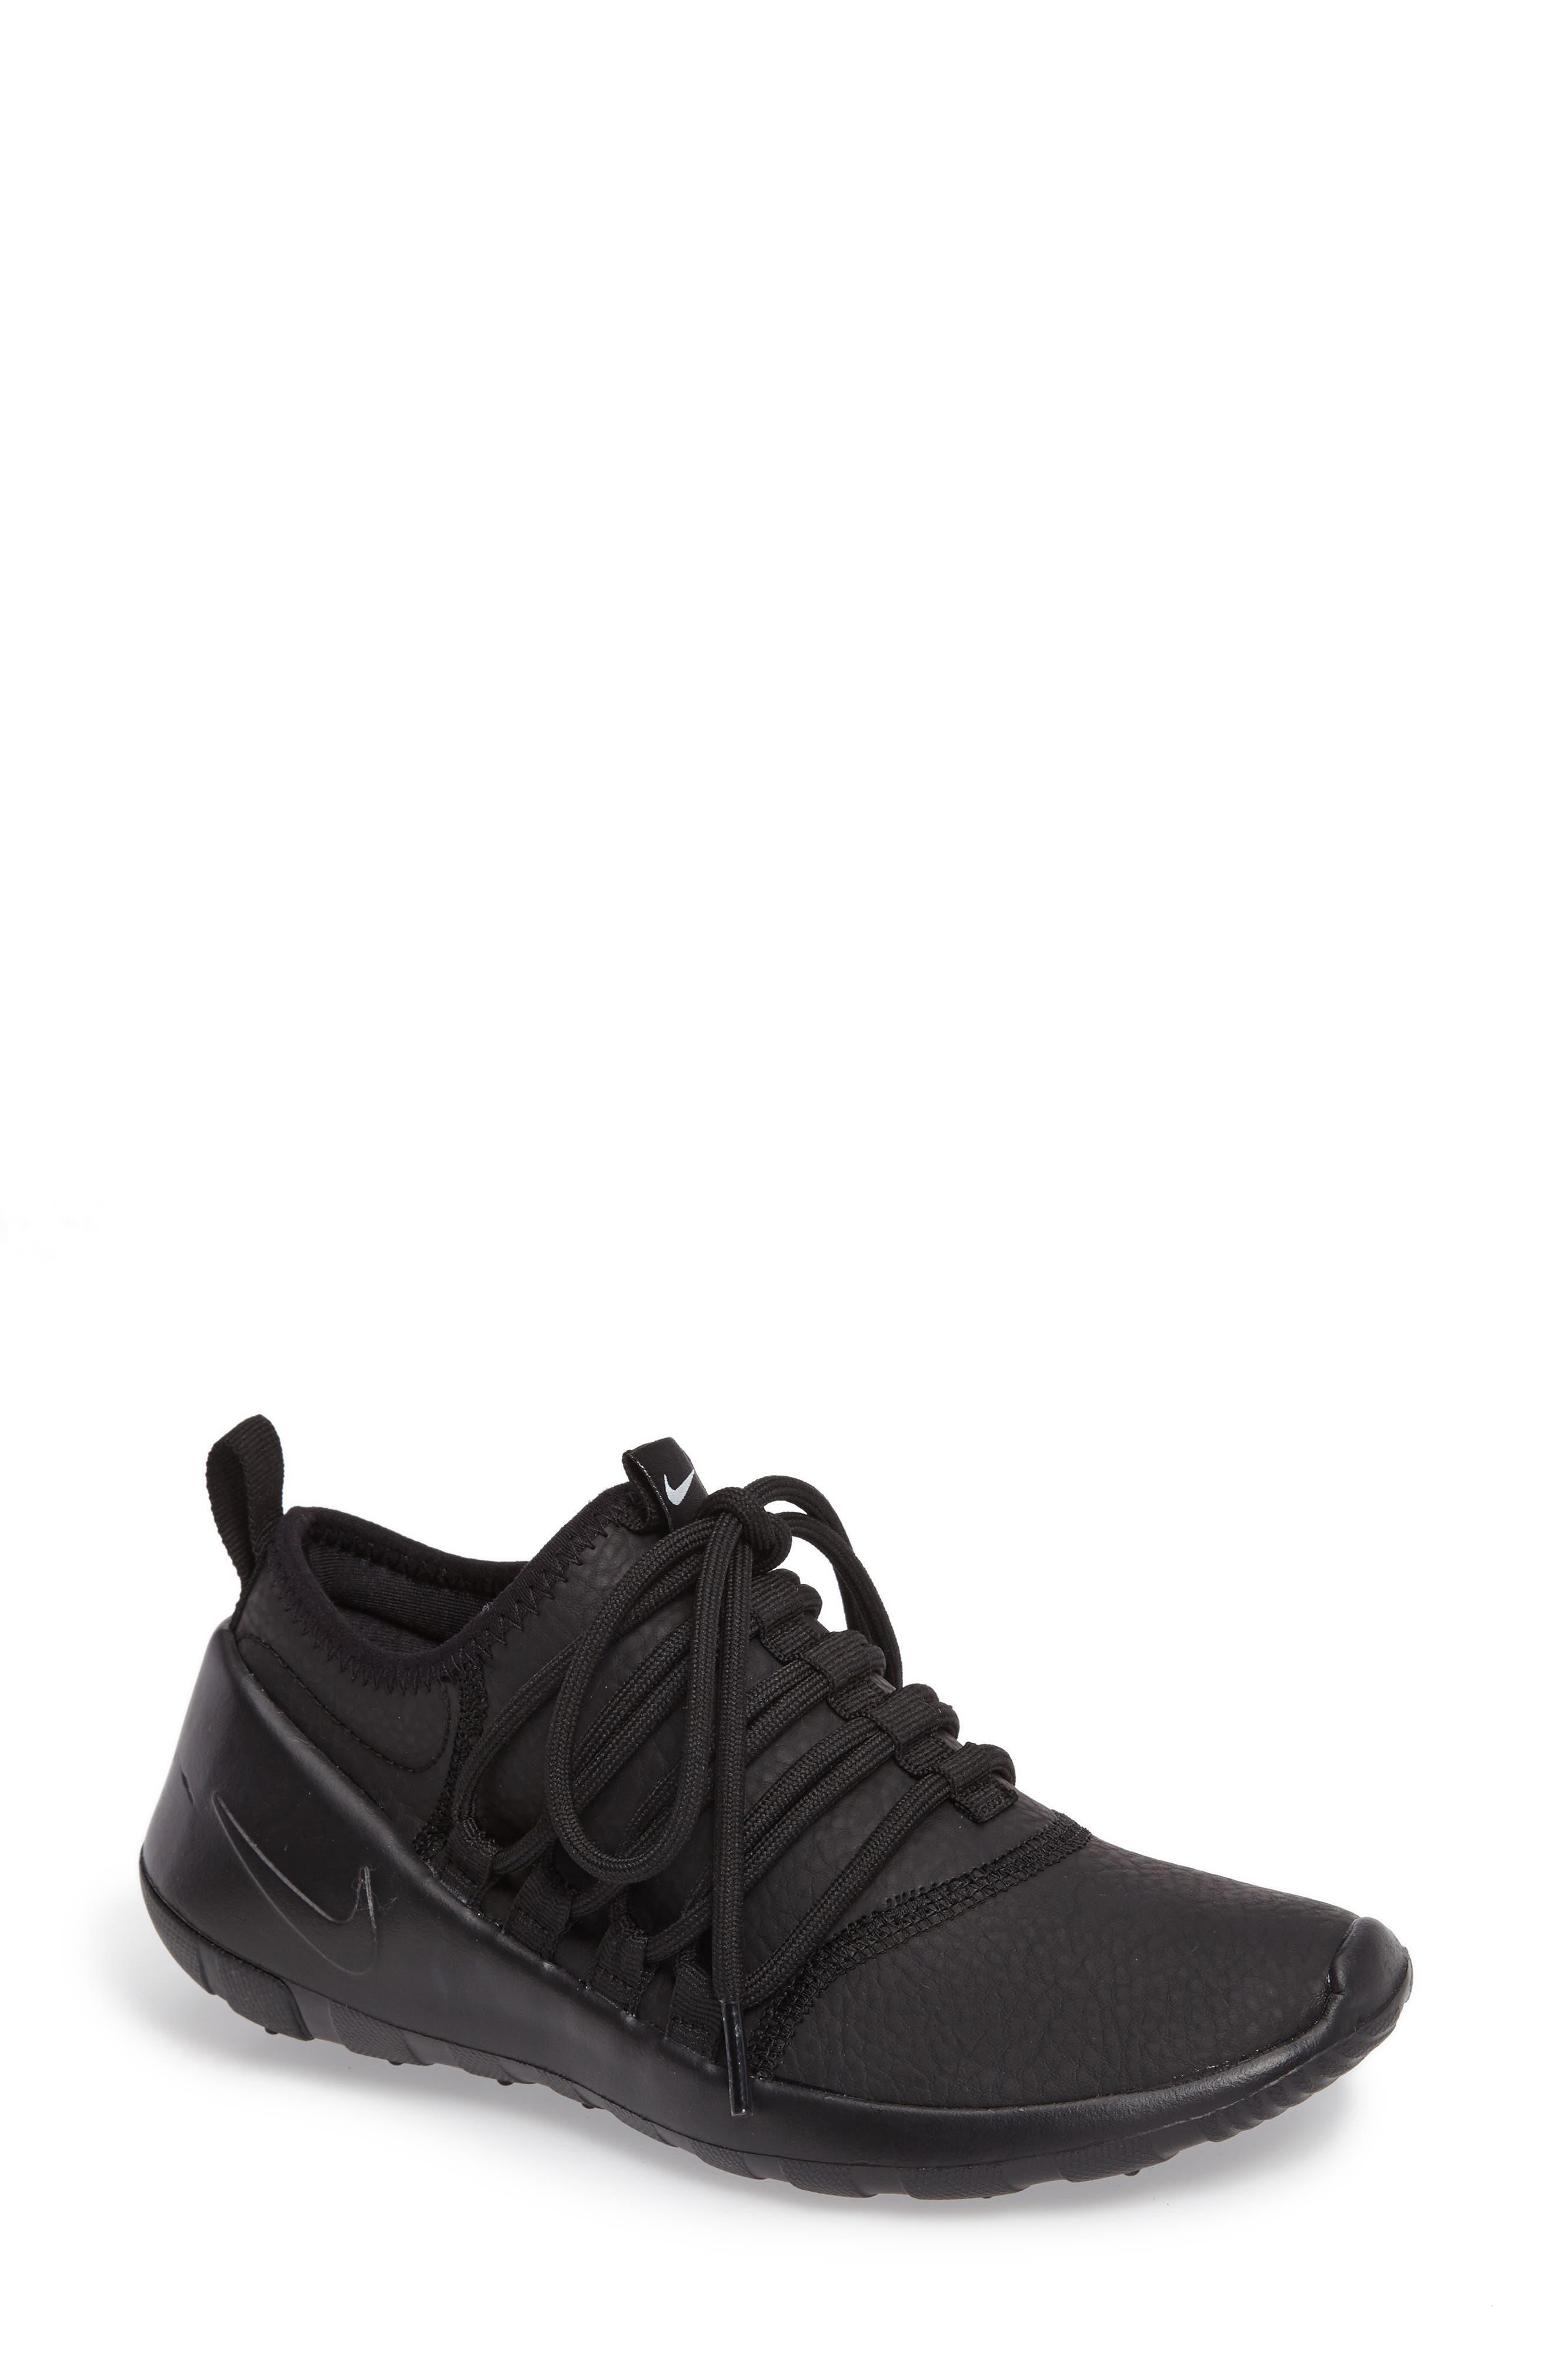 Payaa Premium Sneaker,                             Main thumbnail 1, color,                             001